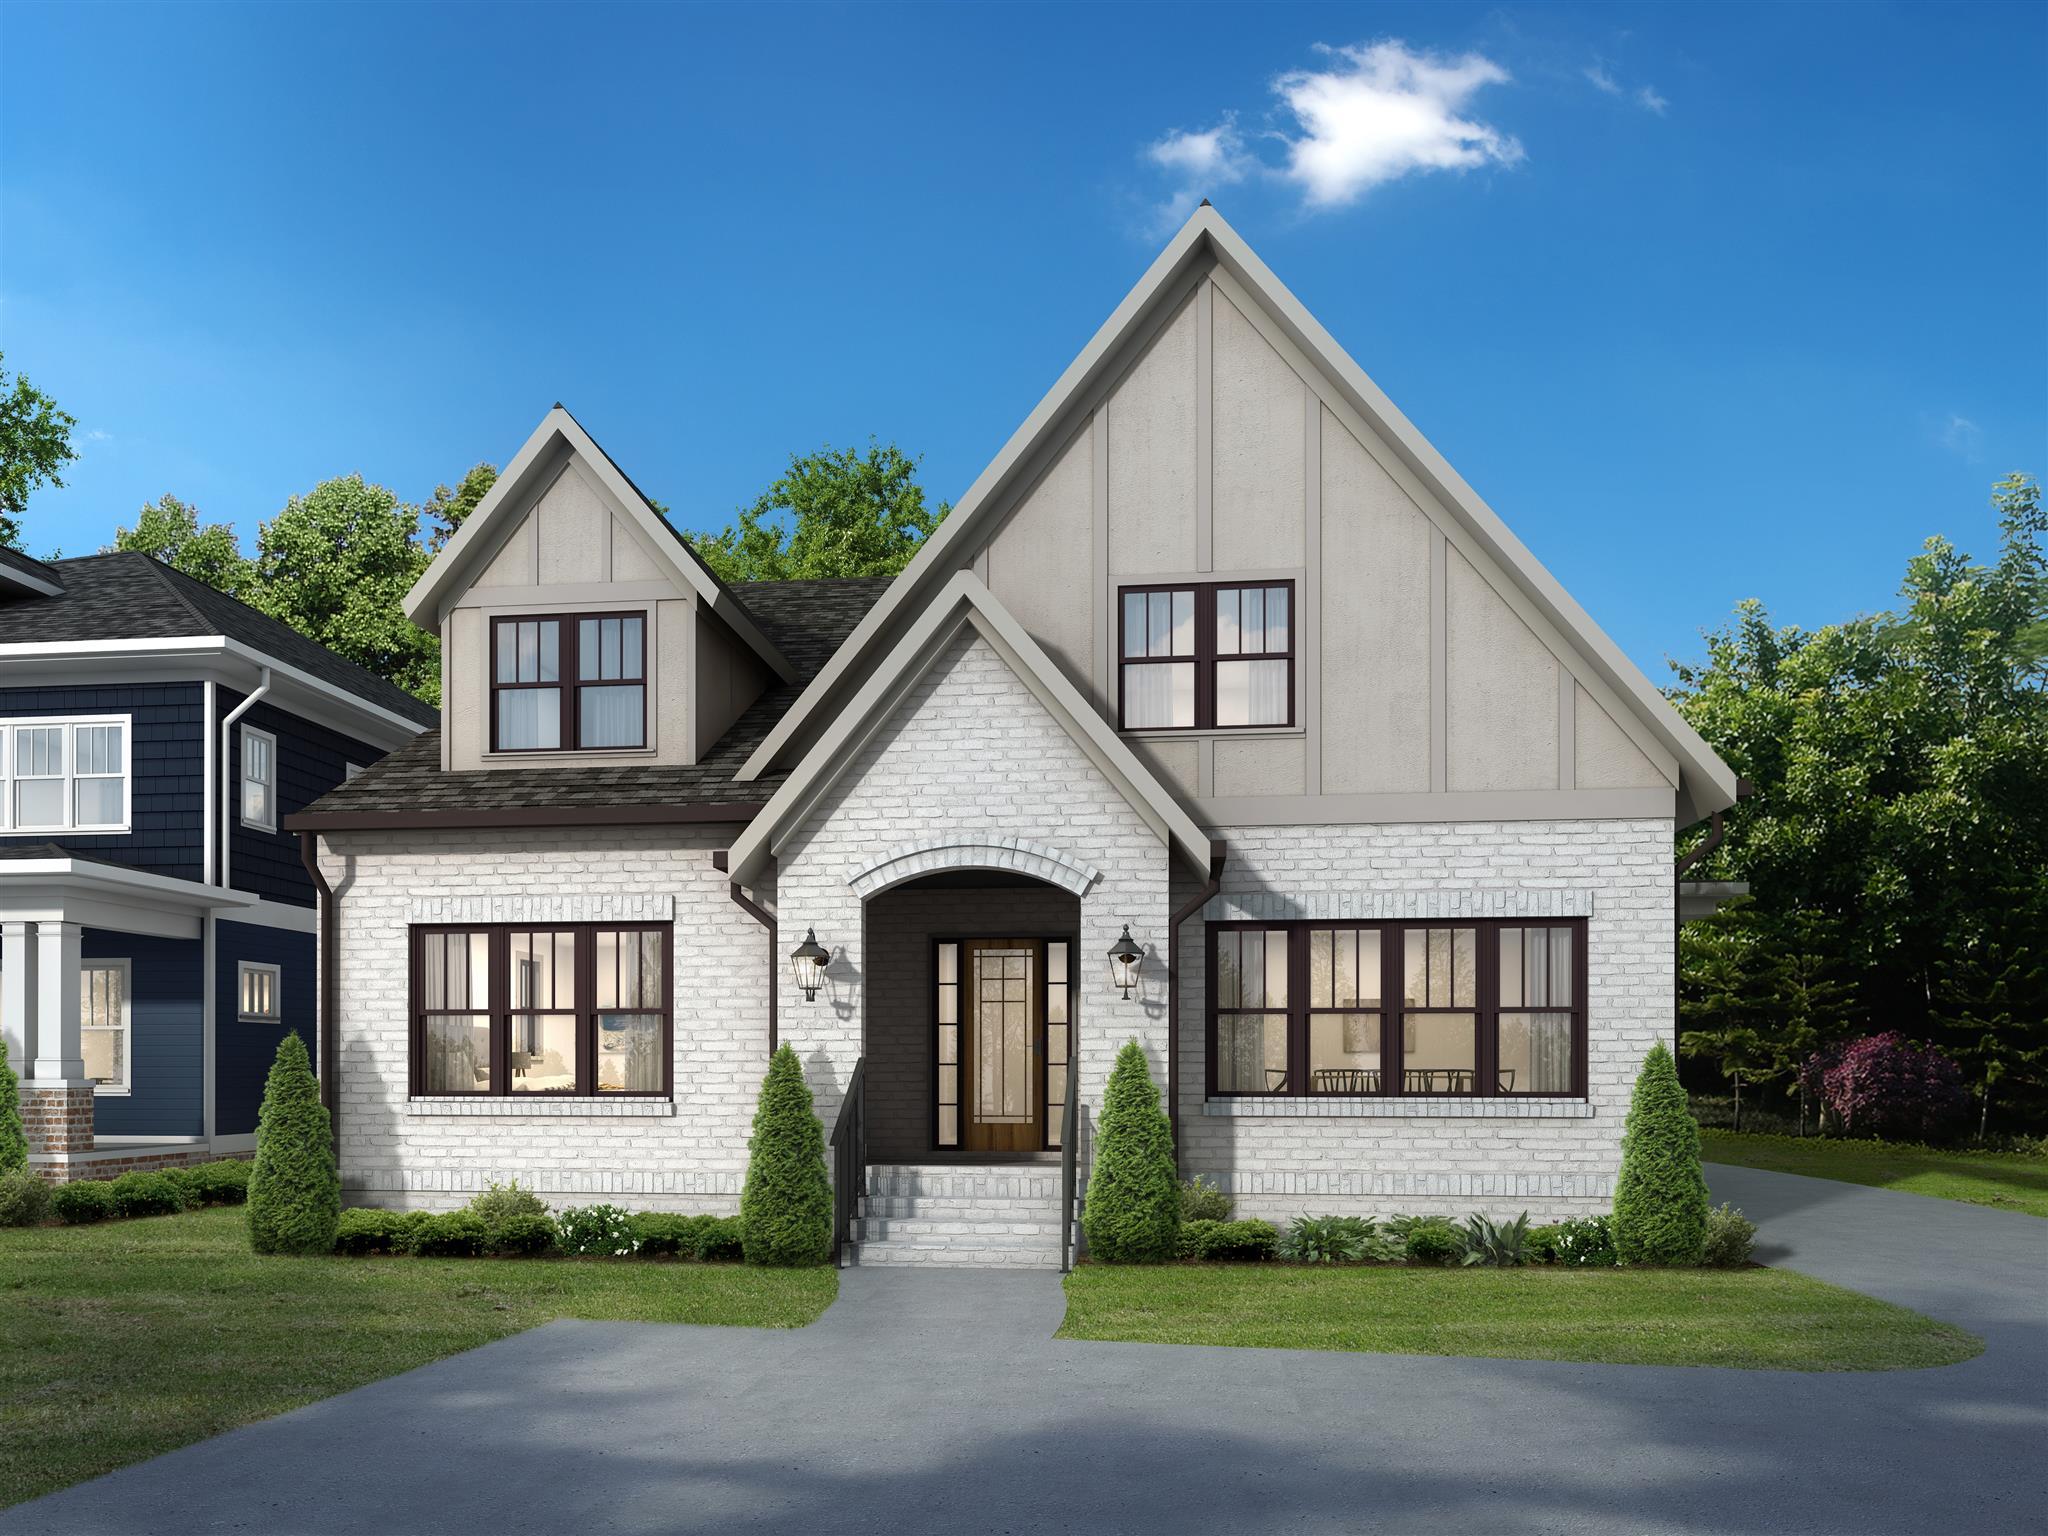 3406 Belmont Blvd., Nashville, TN 37215 - Nashville, TN real estate listing